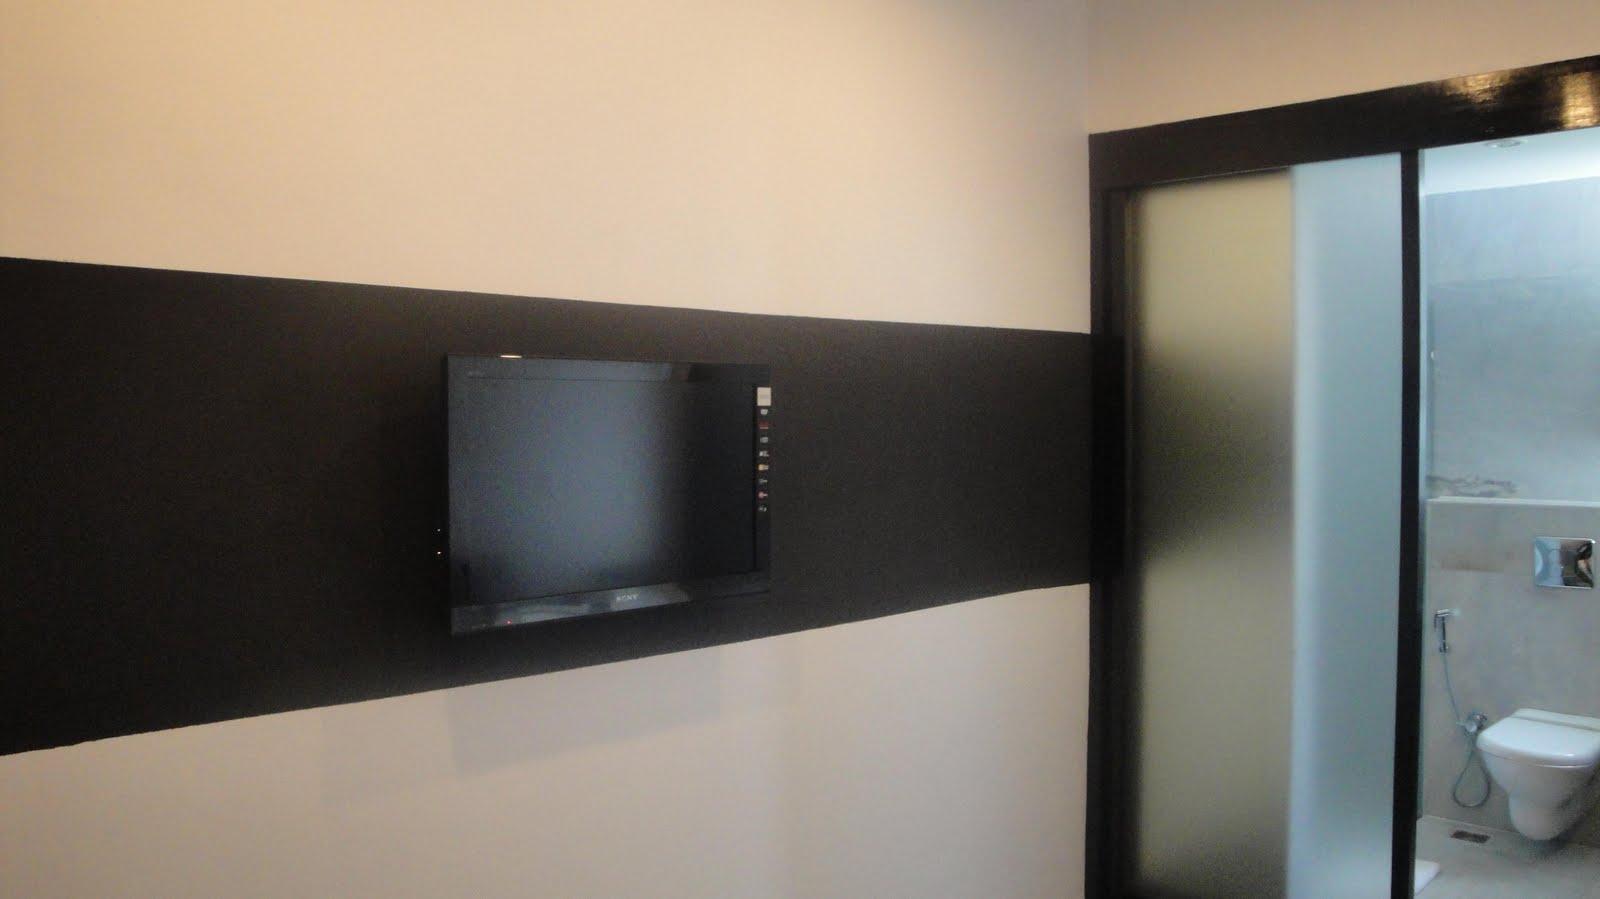 ni blanc ni noir cindyseven. Black Bedroom Furniture Sets. Home Design Ideas